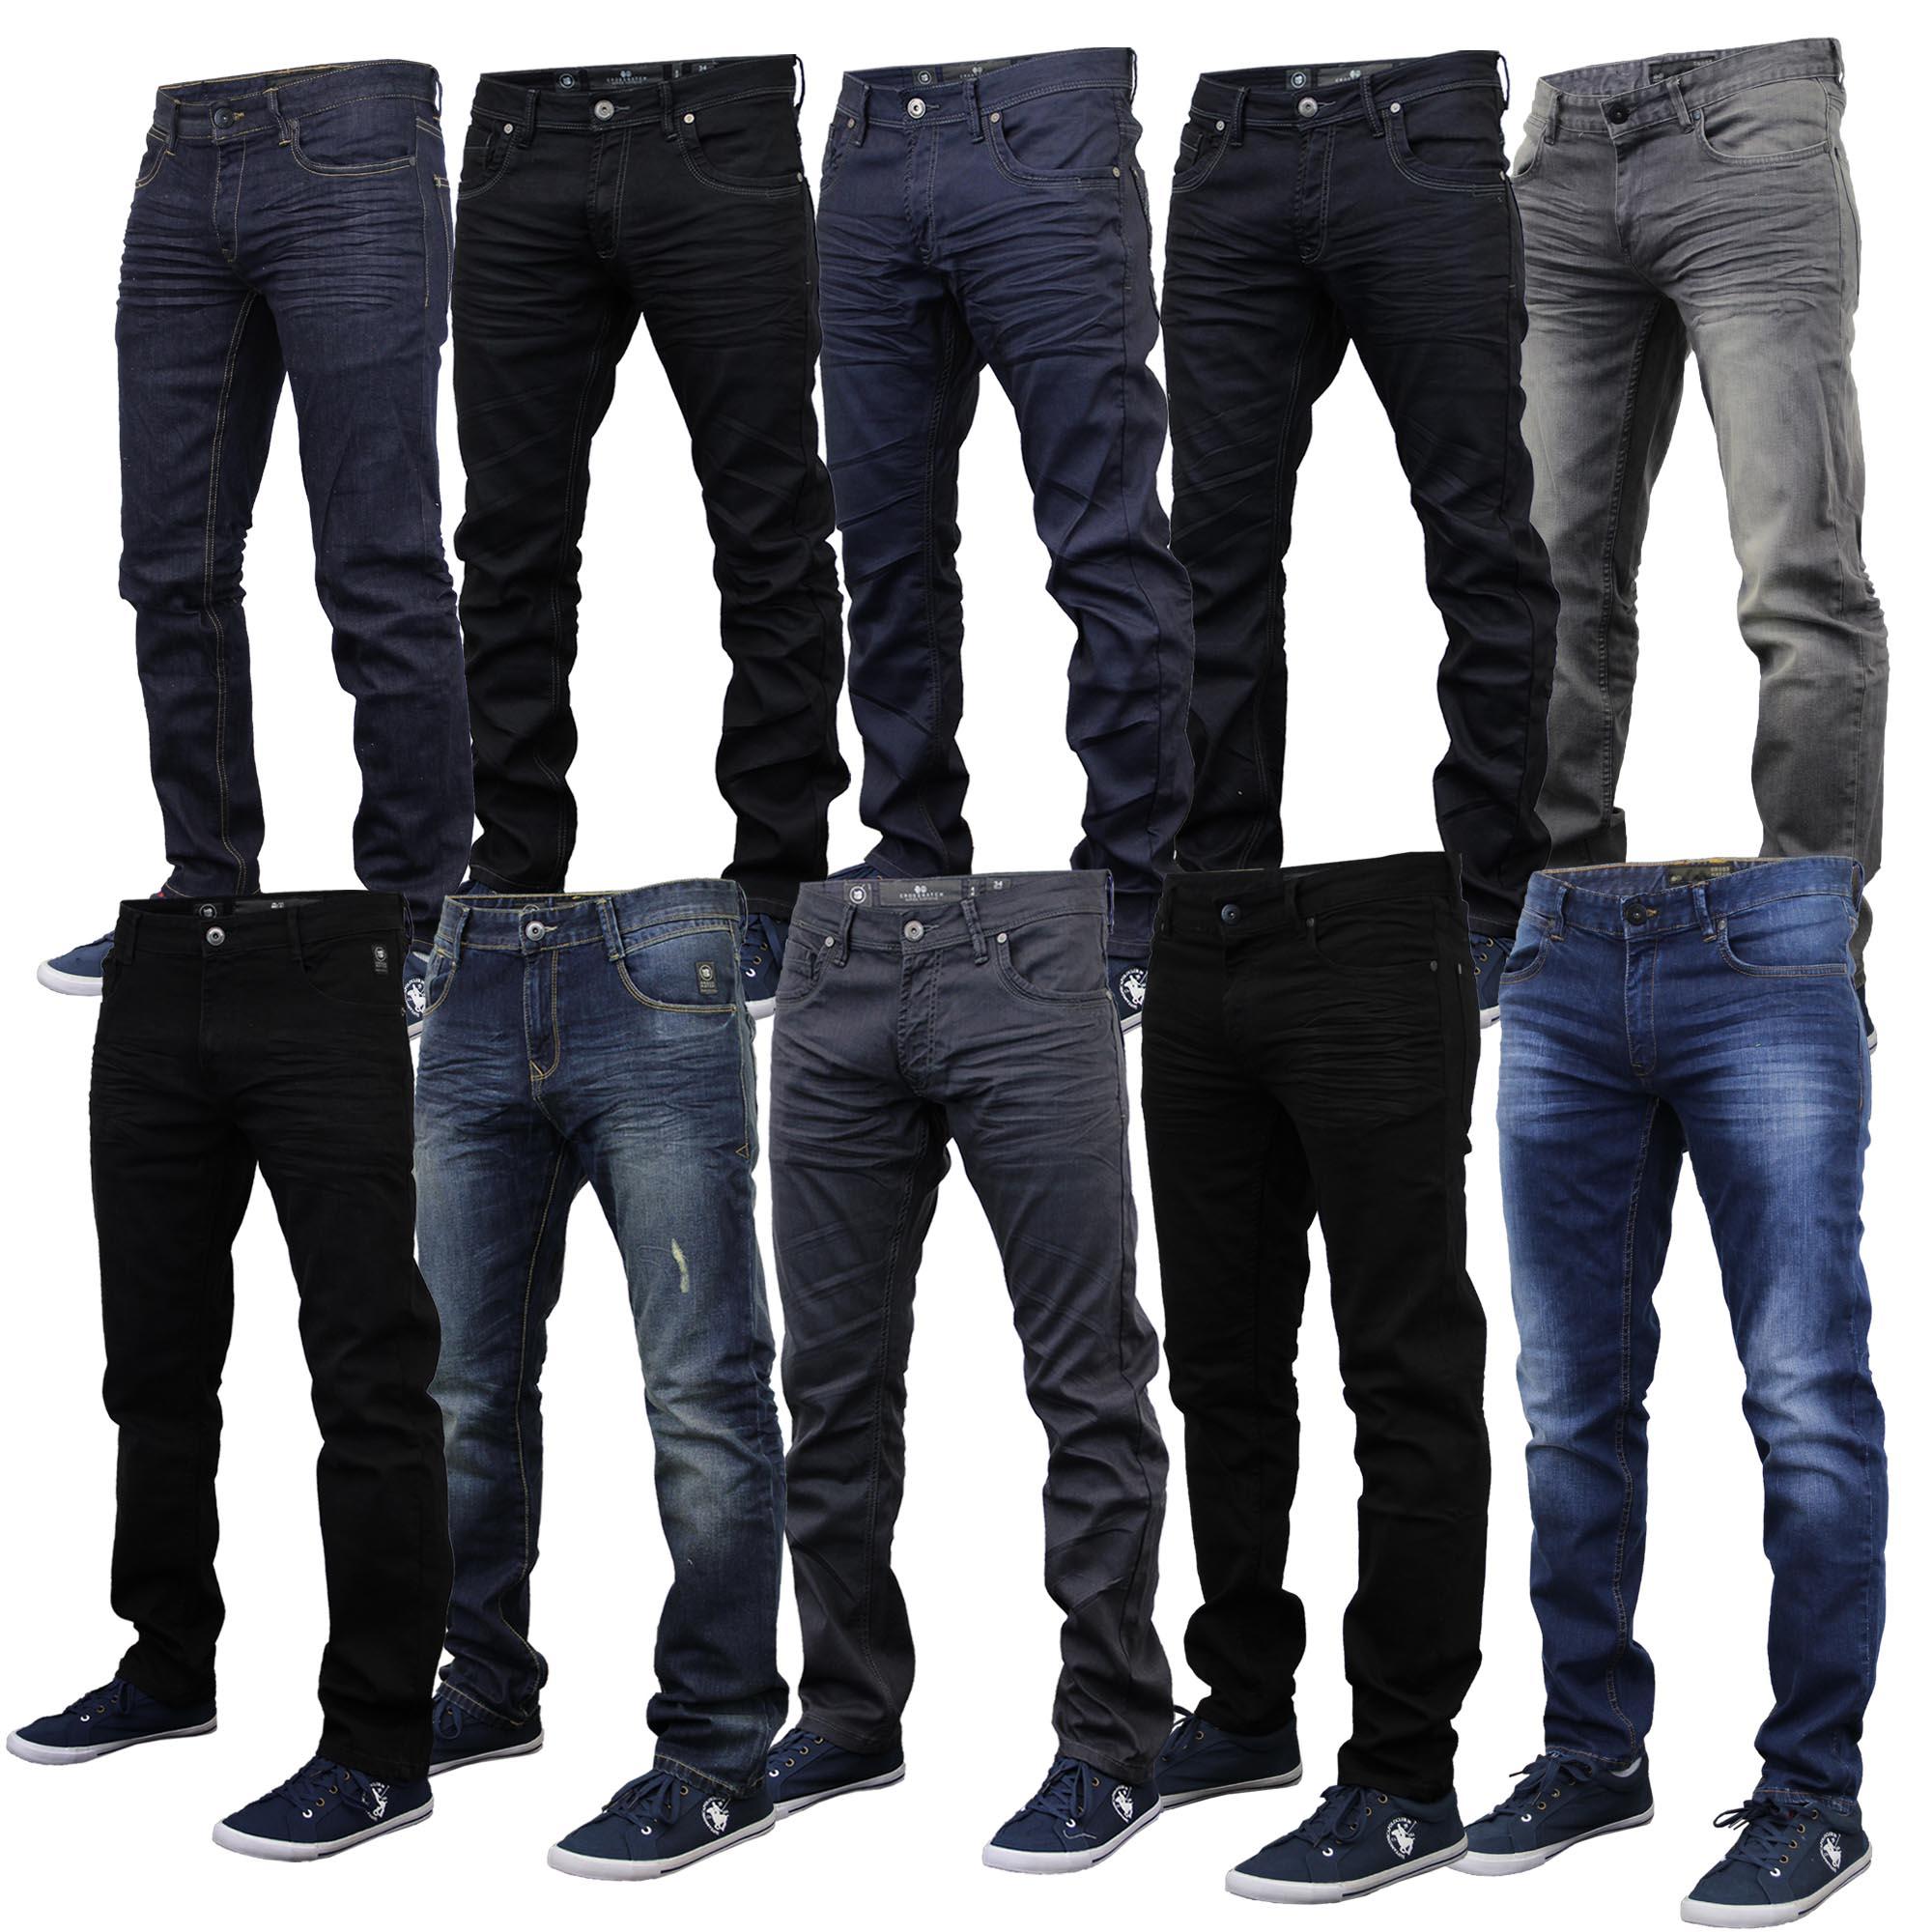 Mens Denim Jeans Crosshatch Pants Slim Fit Straight Leg Bottoms Trouser Ruched | eBay